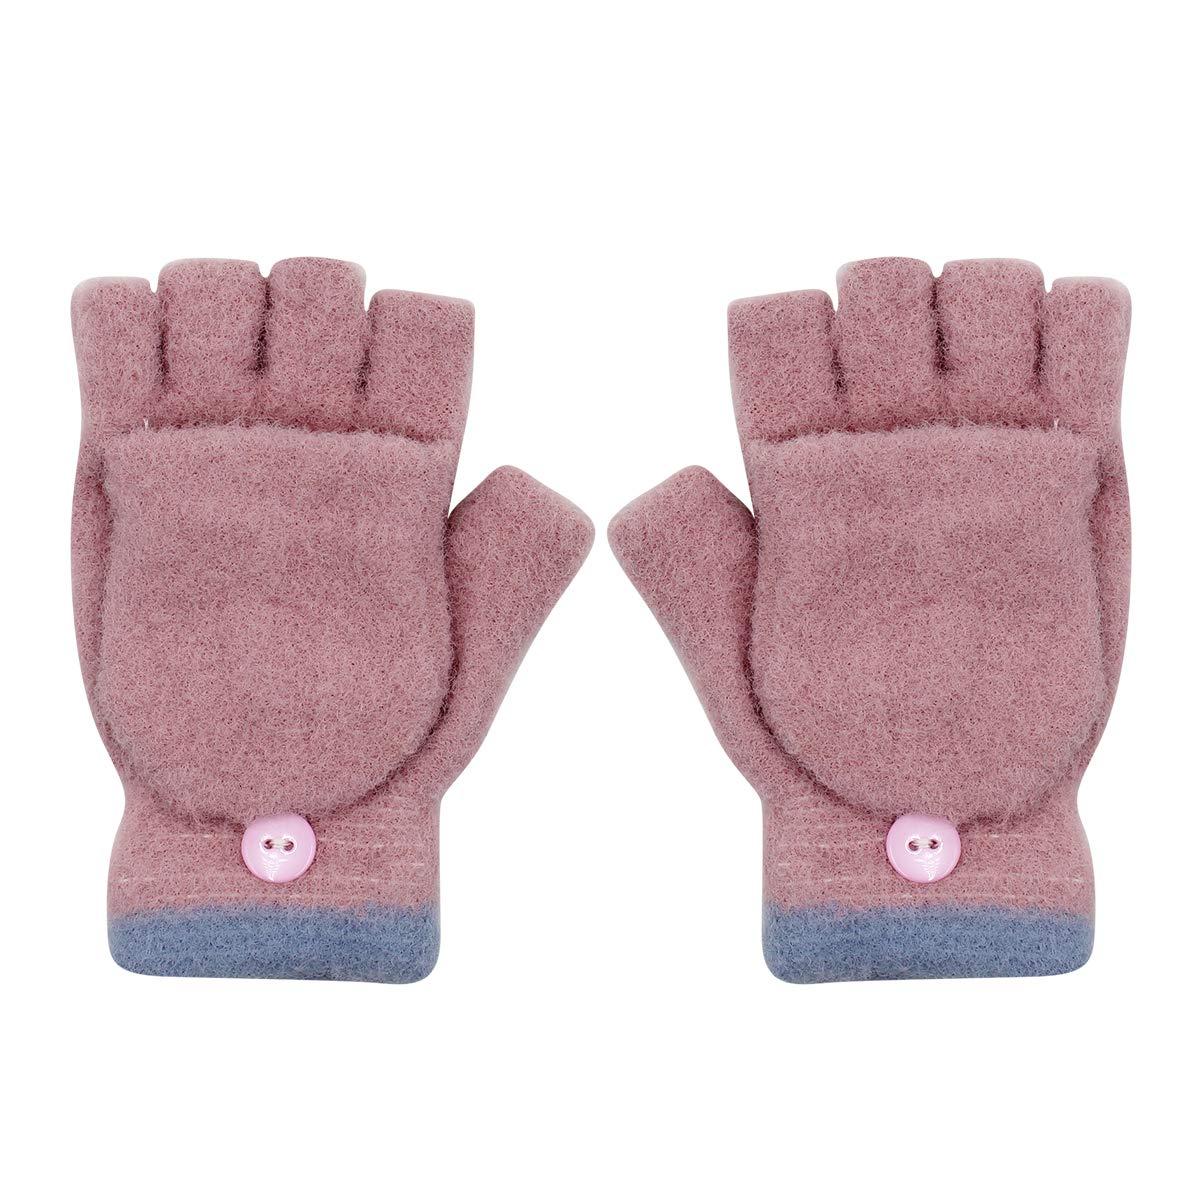 Unisex Kids Gloves Baby Girls Boys Soft Warm Convertible Flip Top Winter Gloves with Mitten Cover